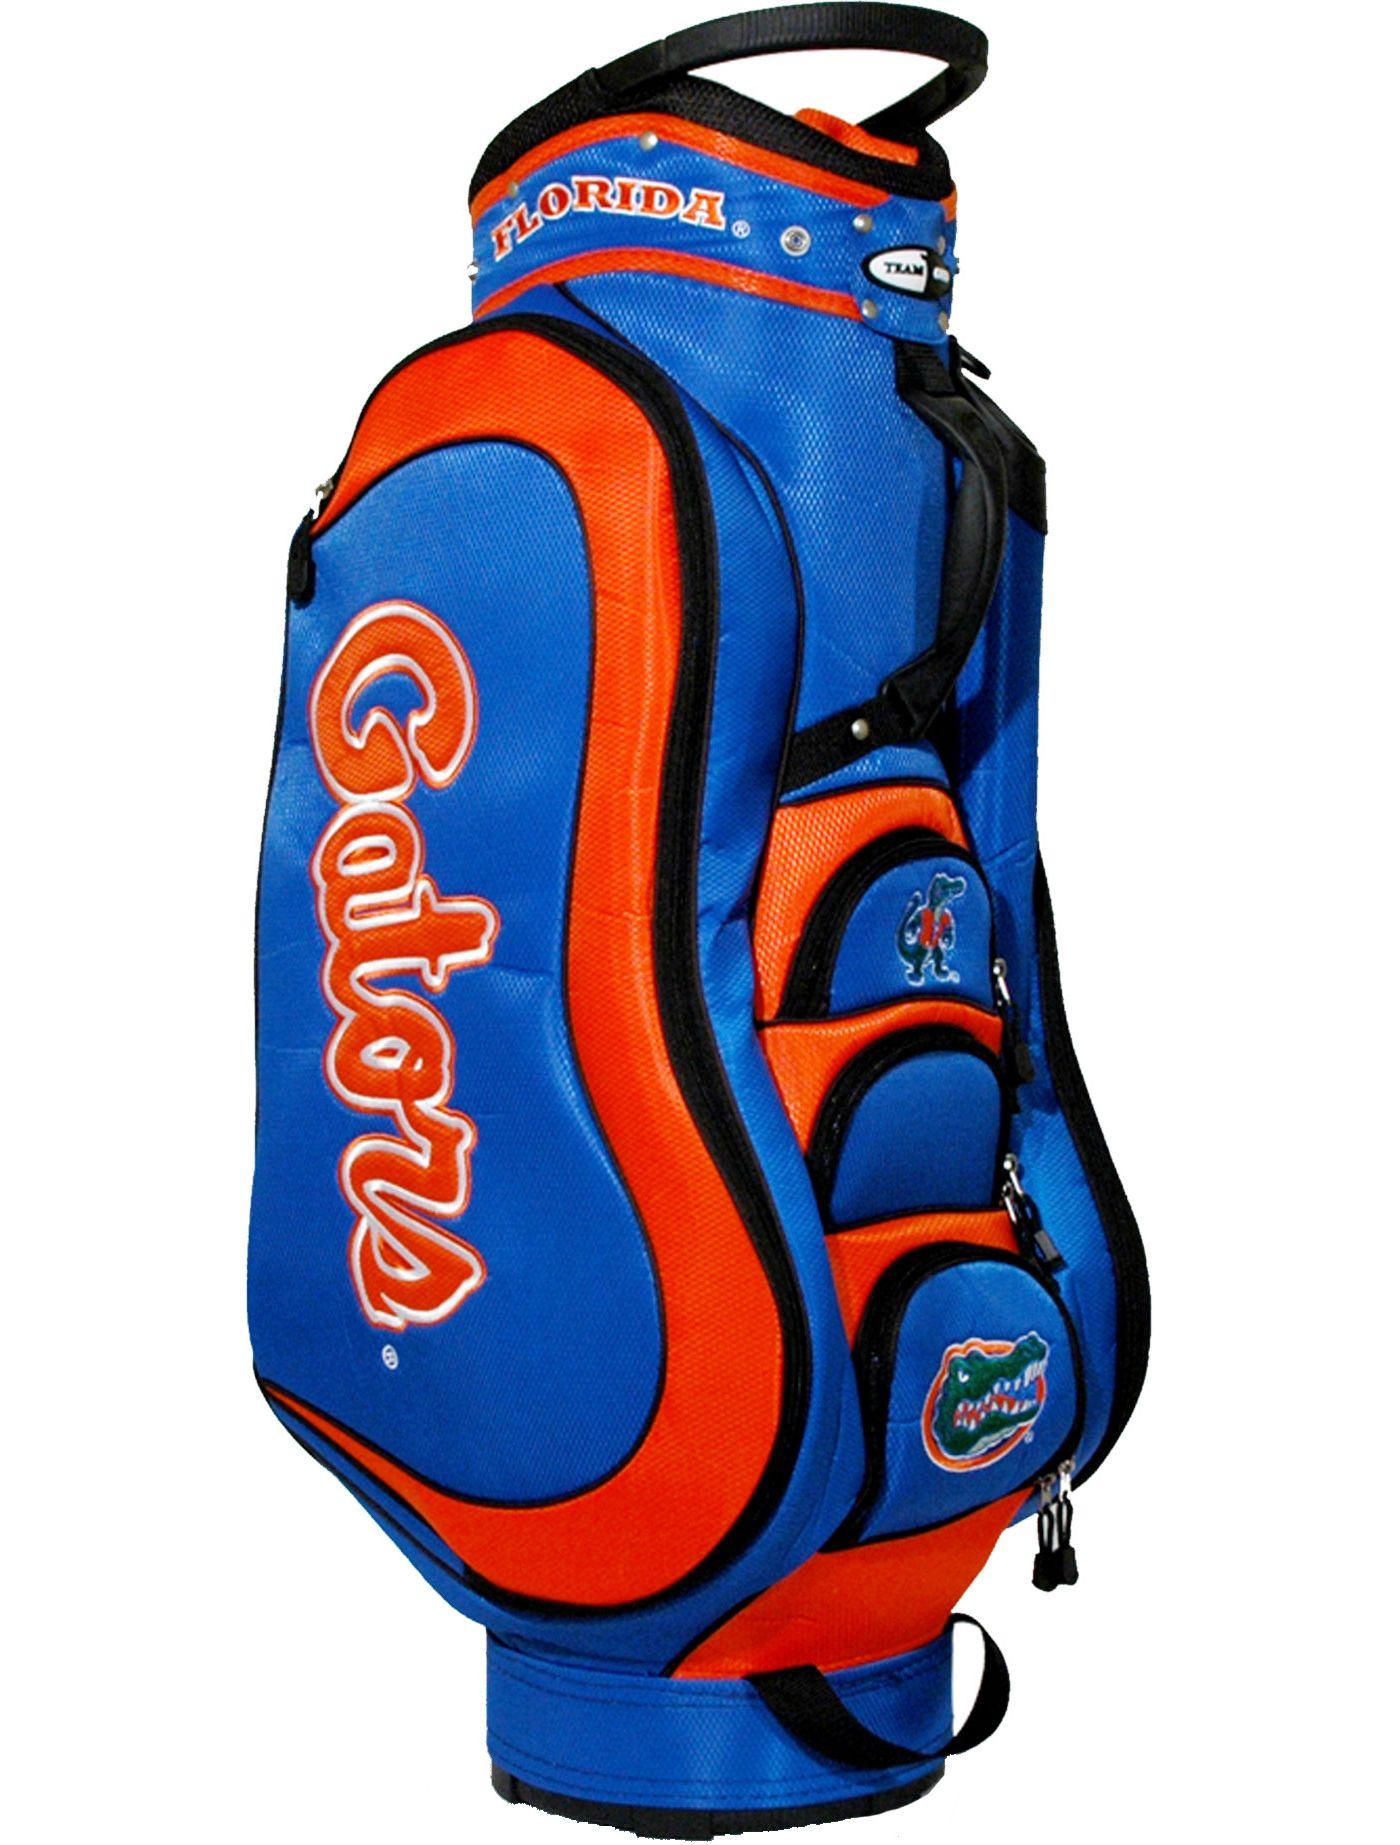 Team Golf Victory Florida Gators Cart Bag